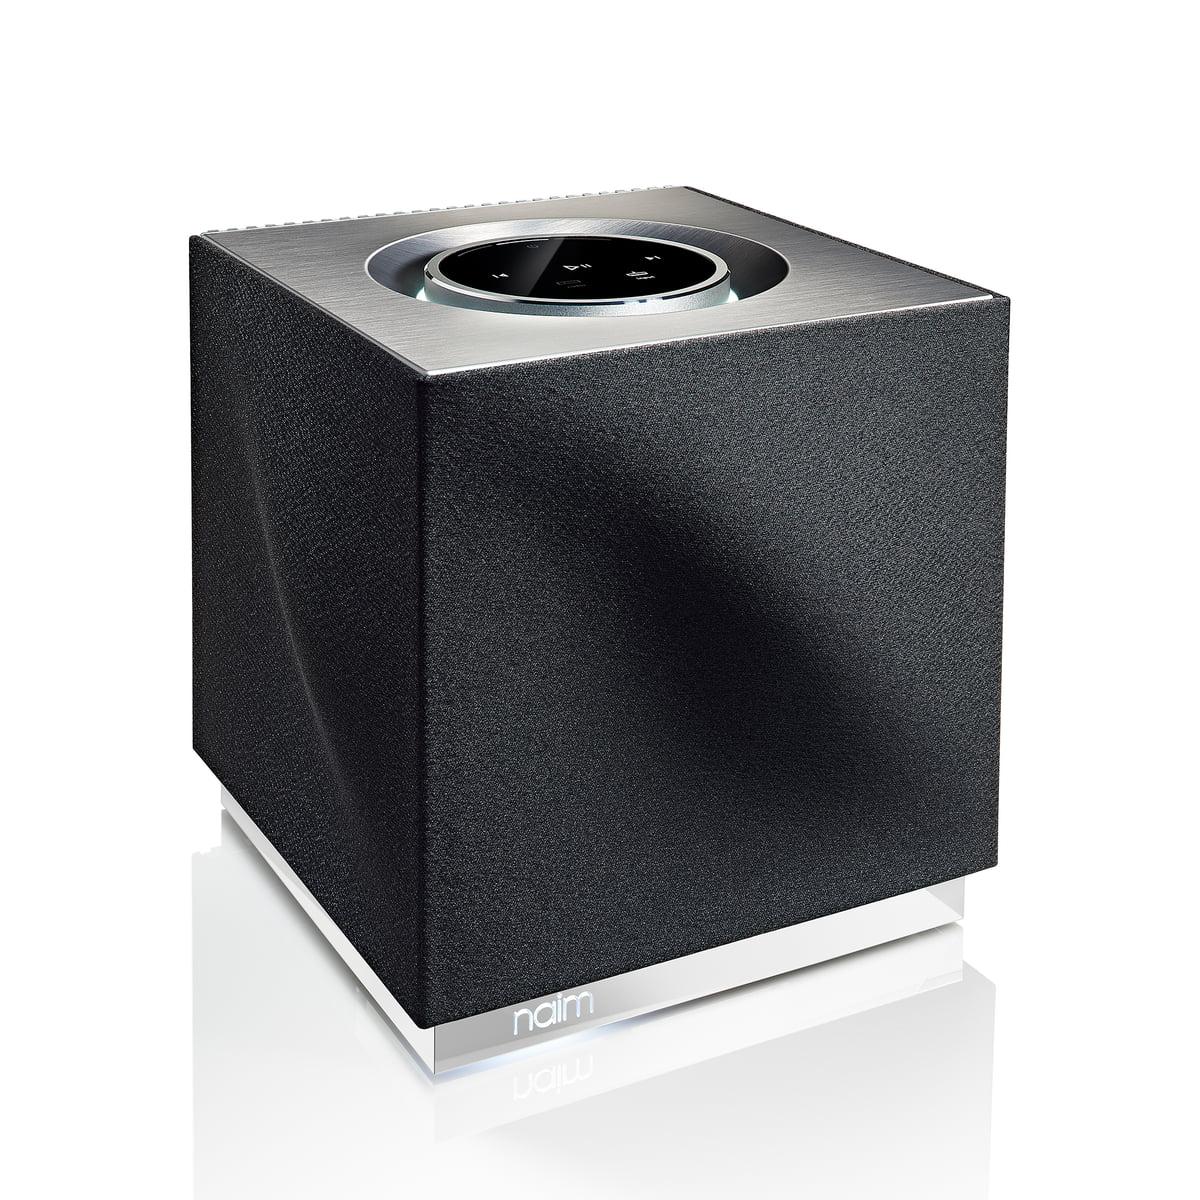 mu so qb musiksystem von naim kaufen. Black Bedroom Furniture Sets. Home Design Ideas